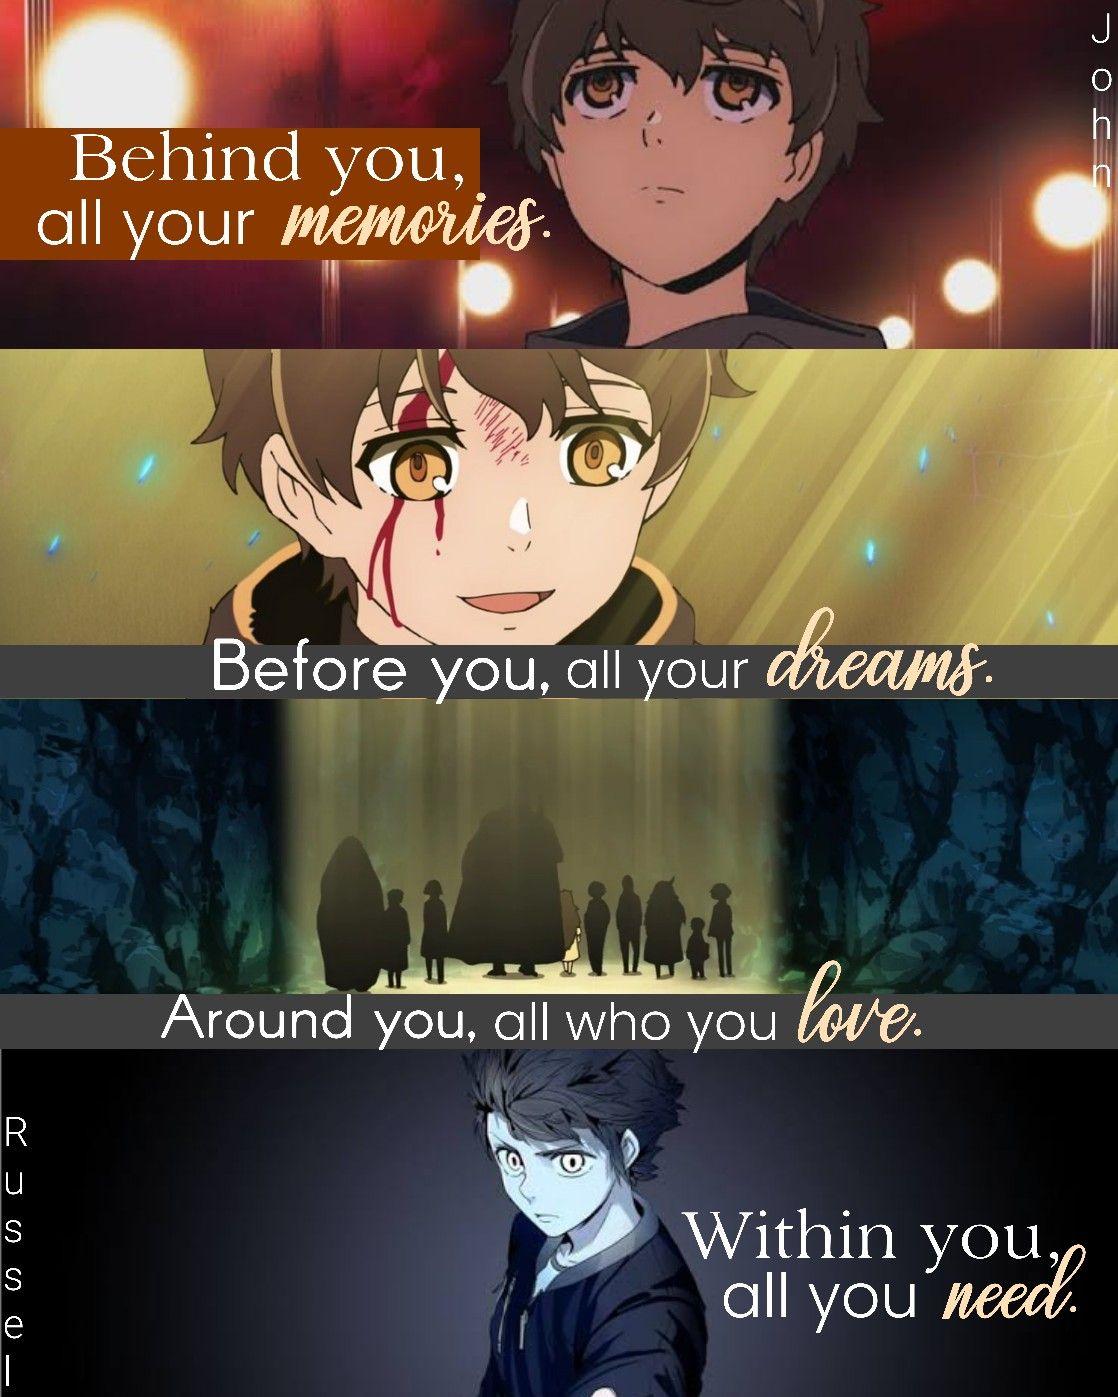 Funny Anime Graduation Quotes